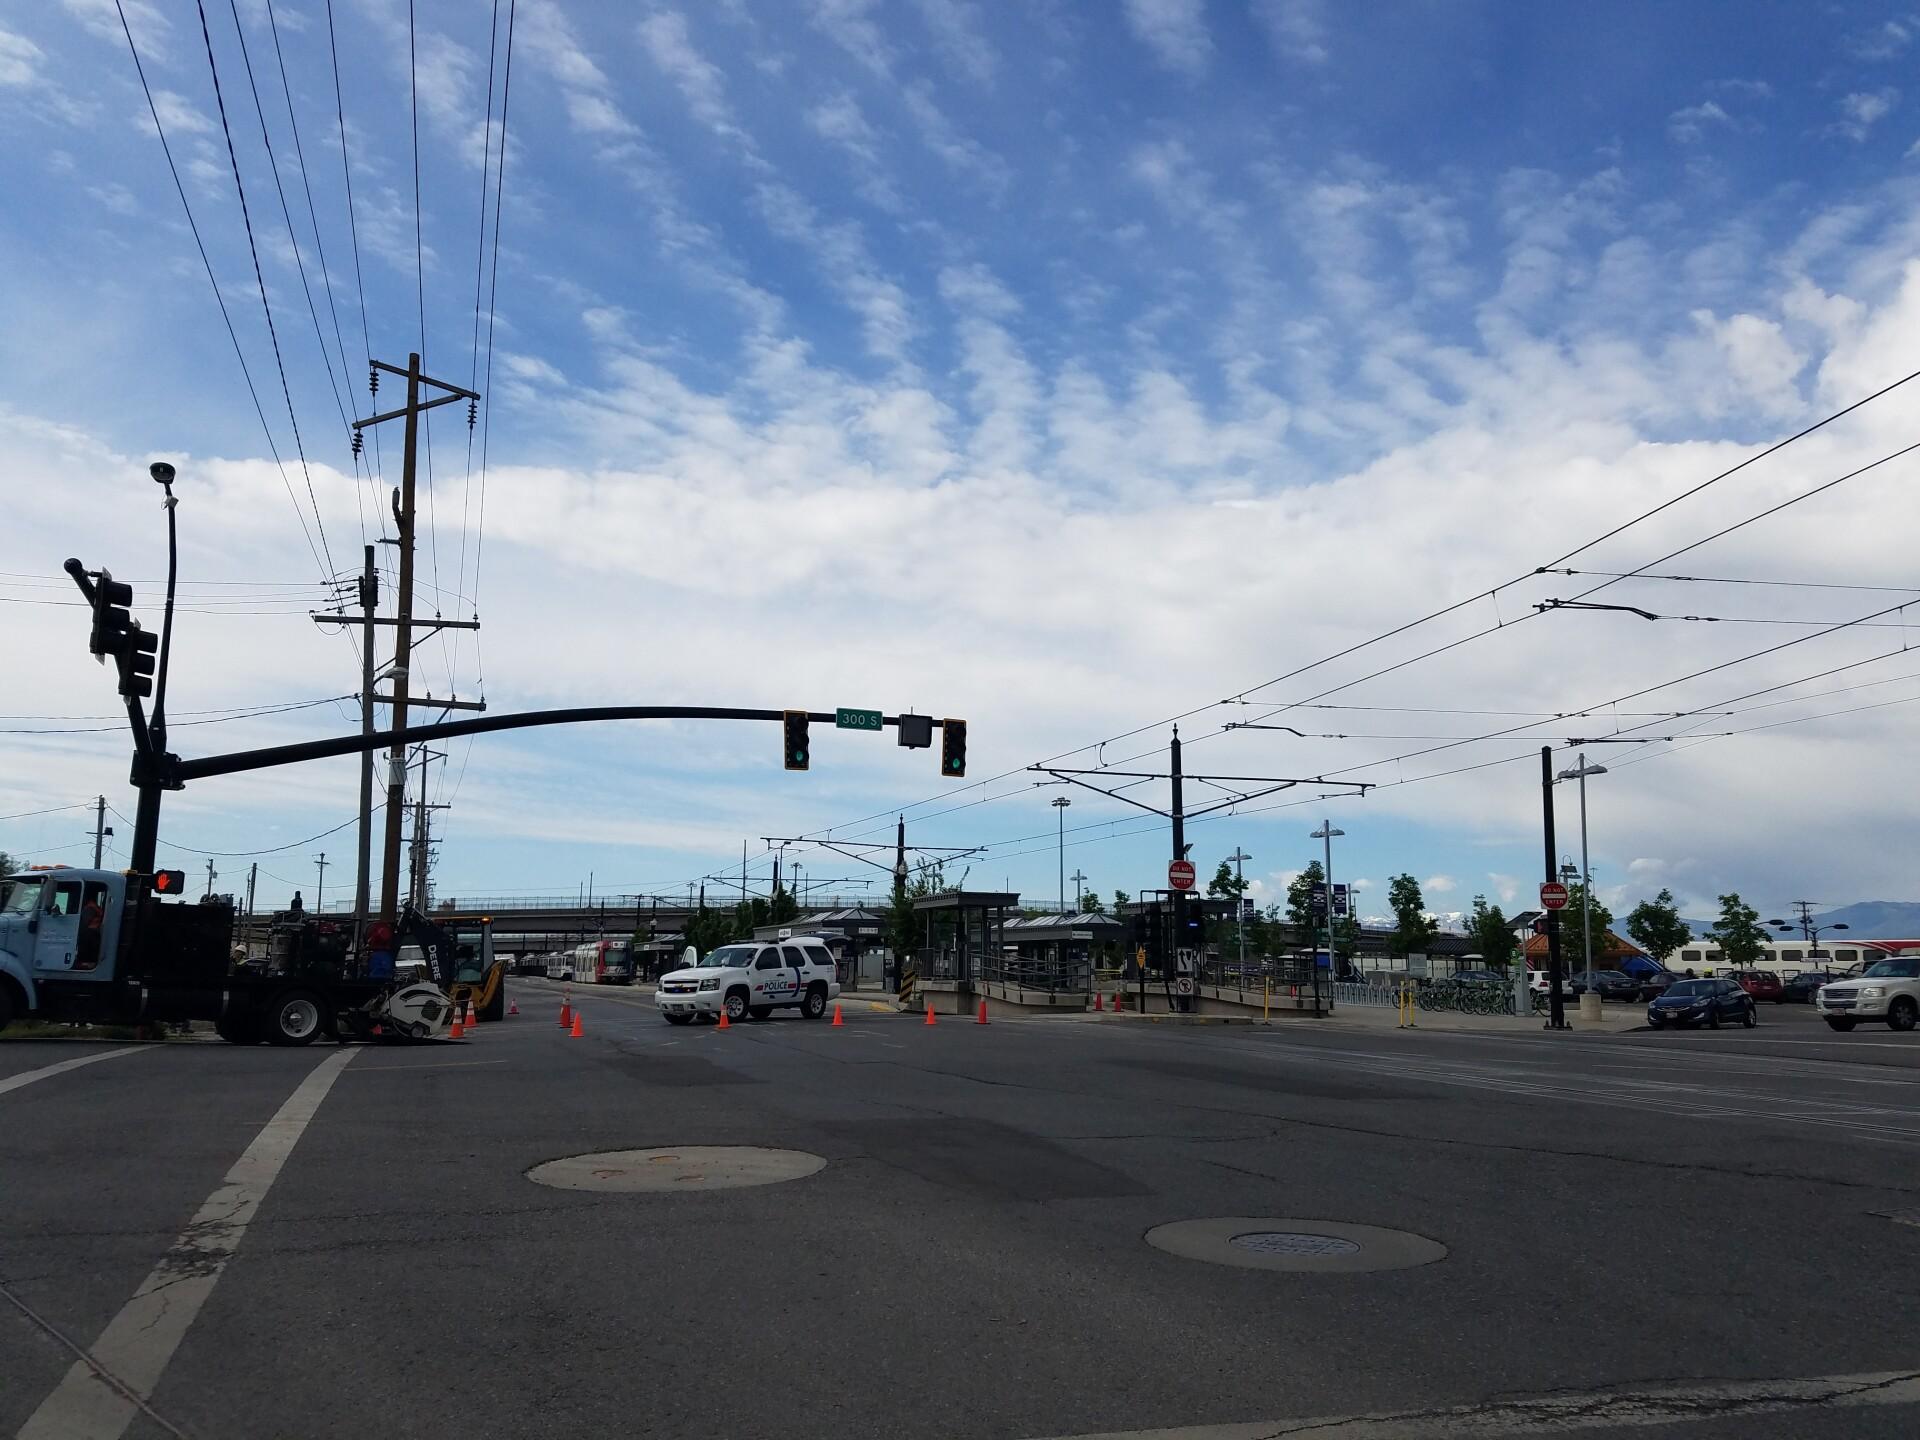 Photos: 'Suspicious item' closes Salt Lake Central TRAXstation